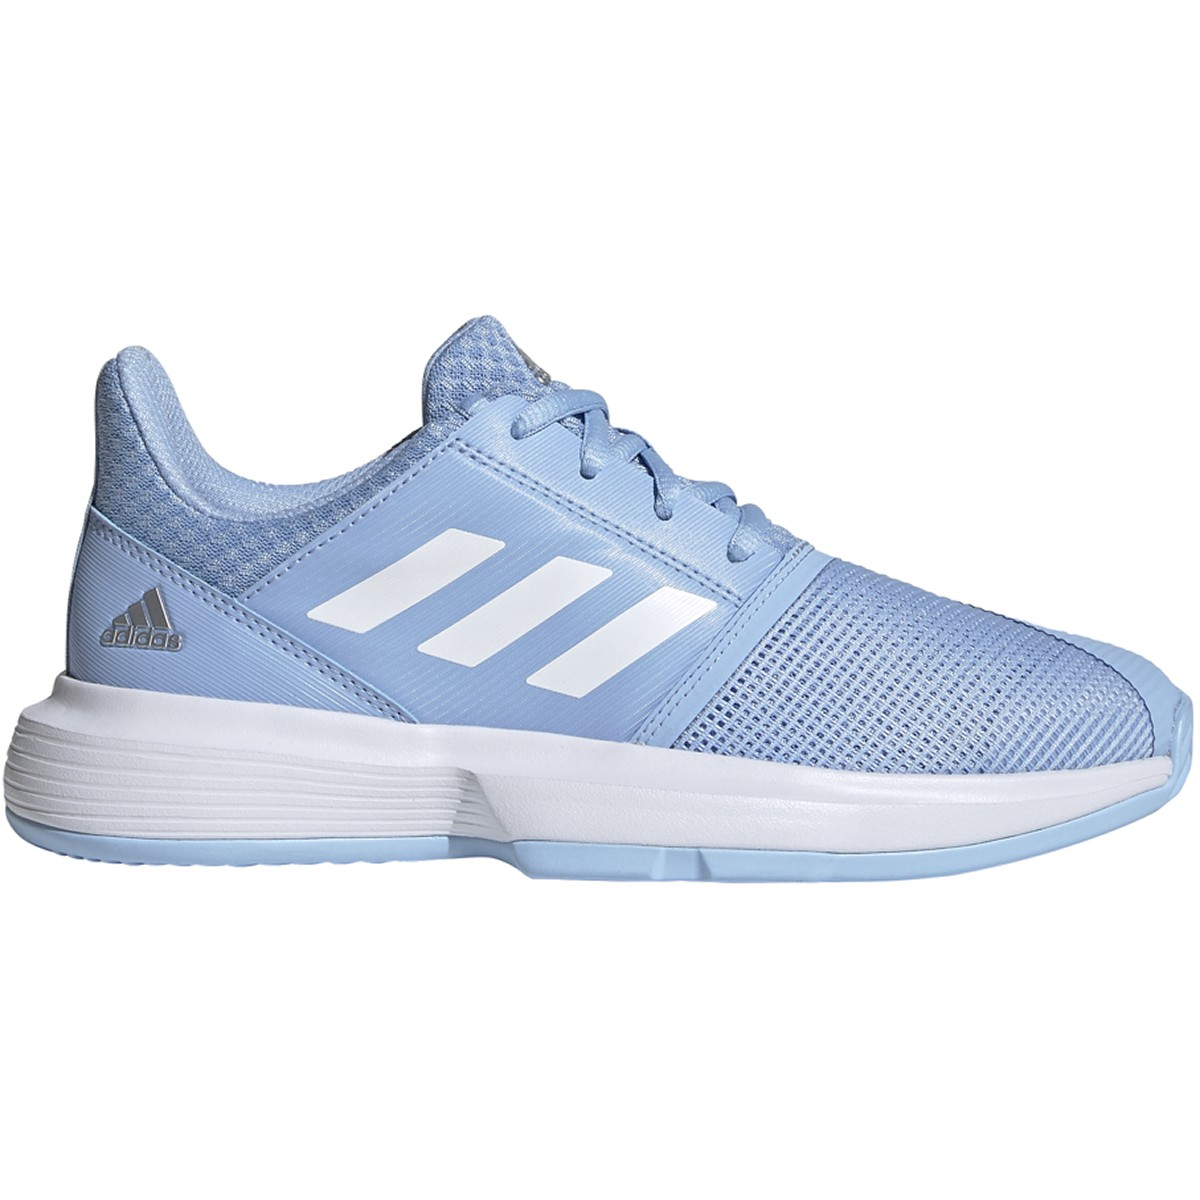 Adidas Junior CourtJam xJ Tennis Shoes